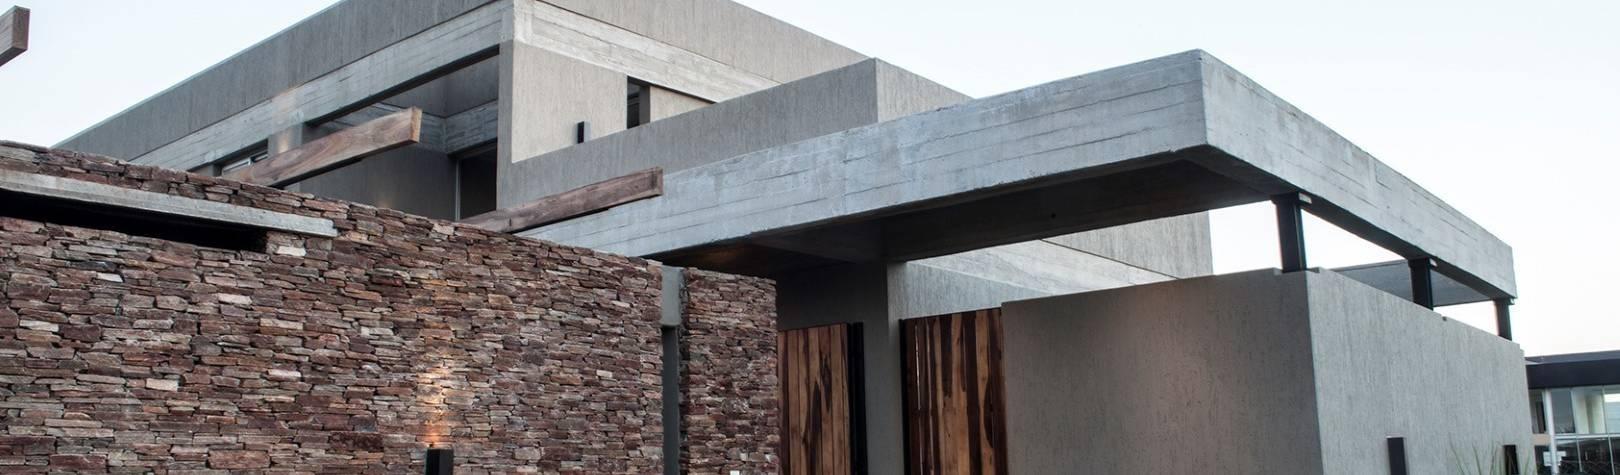 FAARQ – Facundo Arana Arquitecto & asoc.